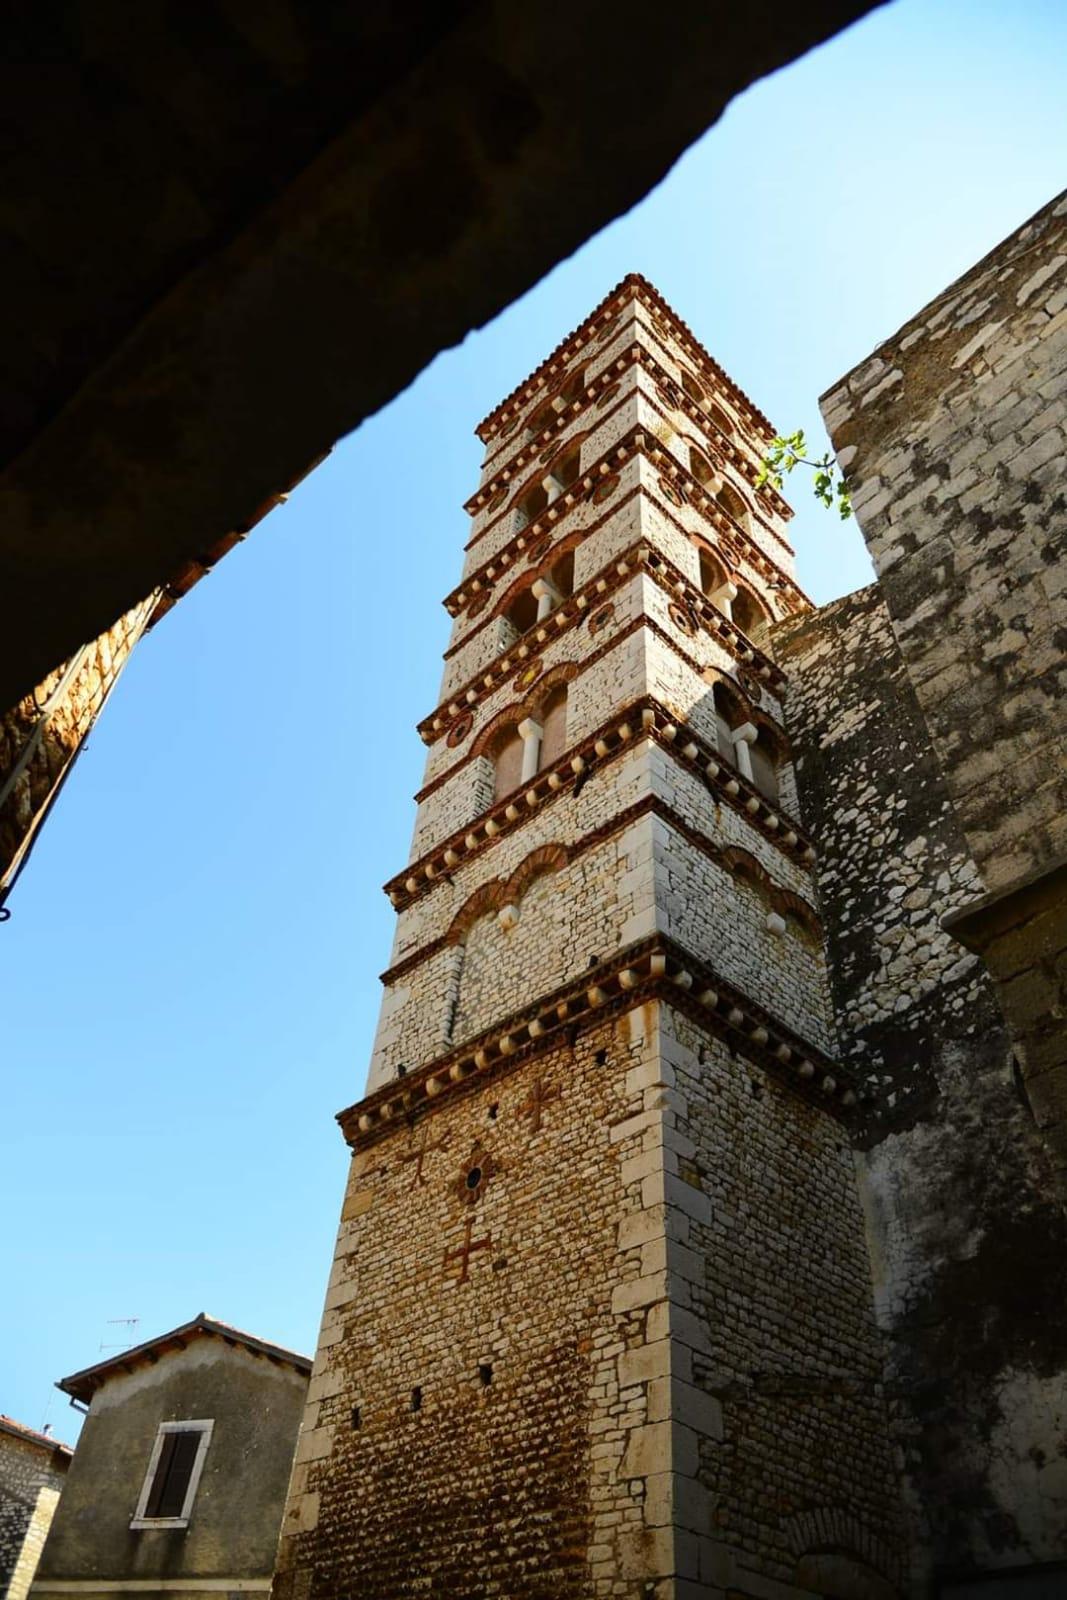 Sermoneta - Duomo